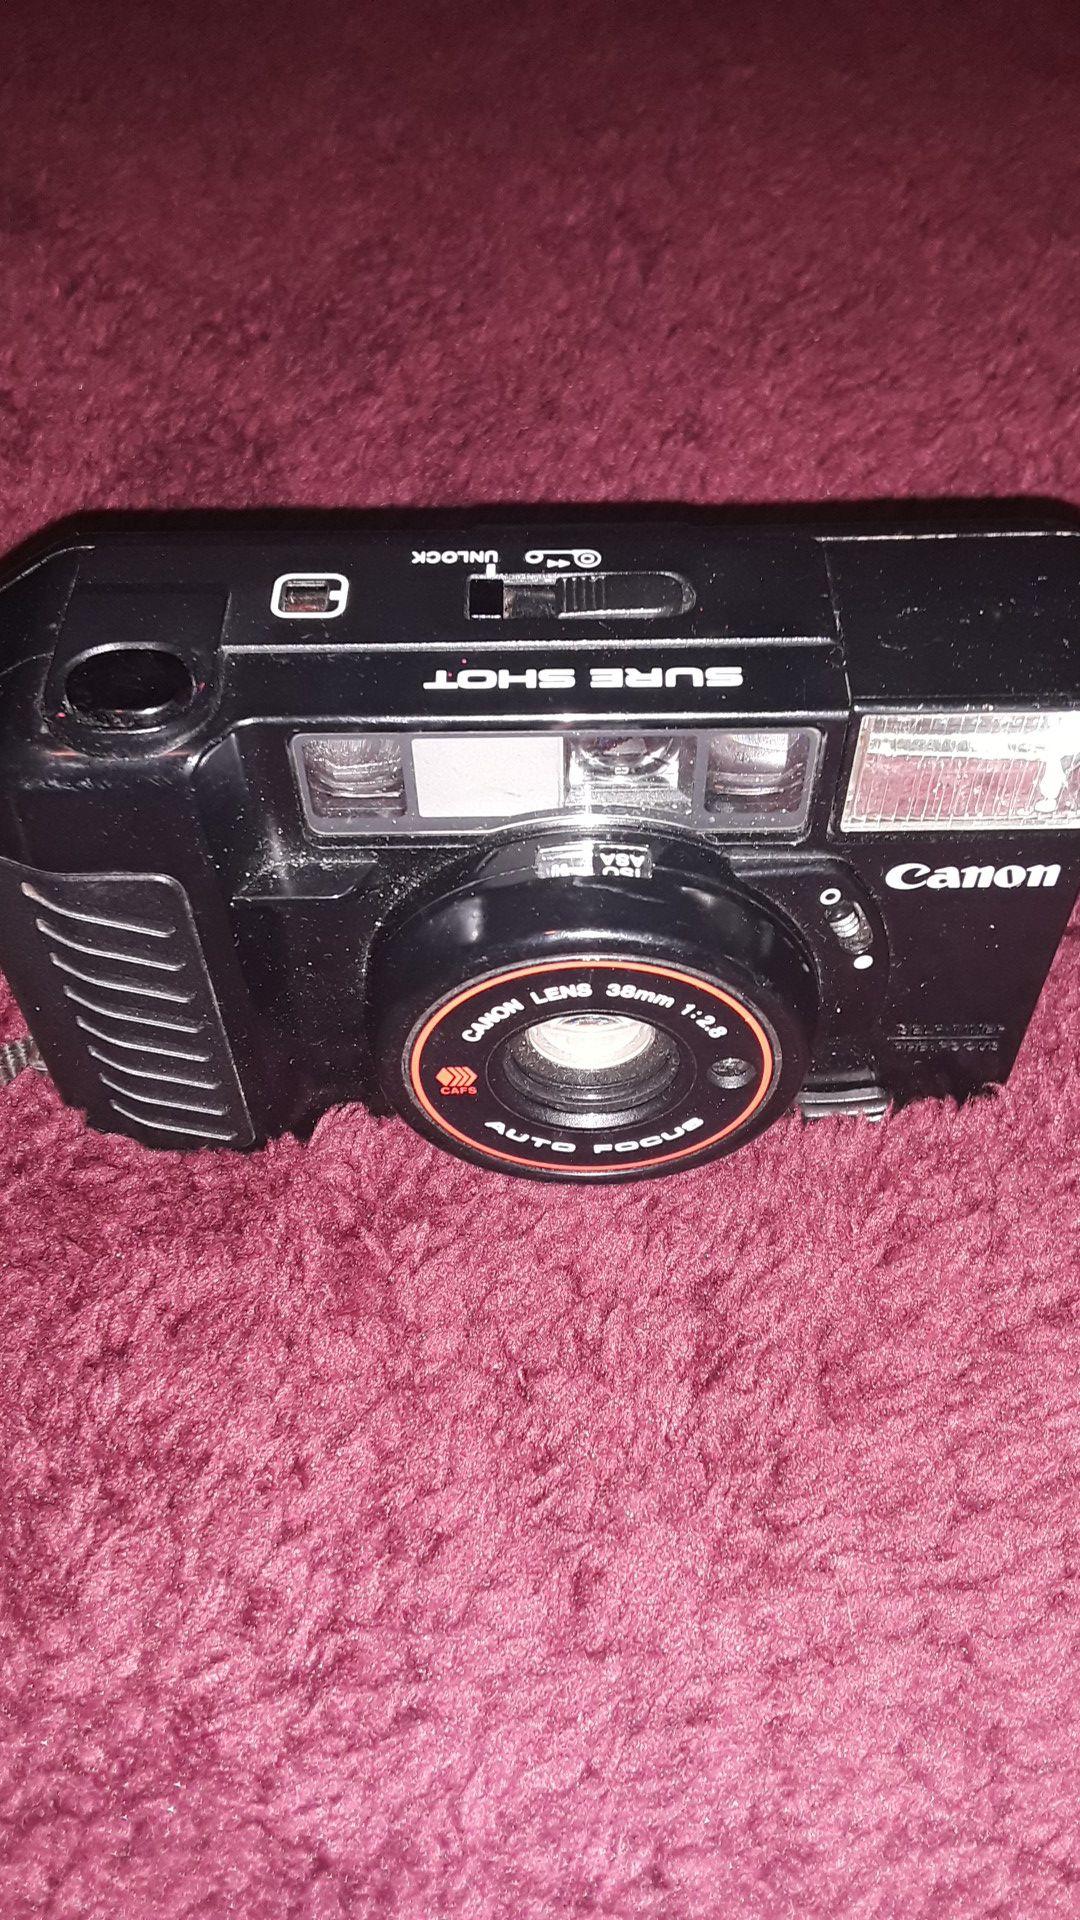 Canon vintage film camera